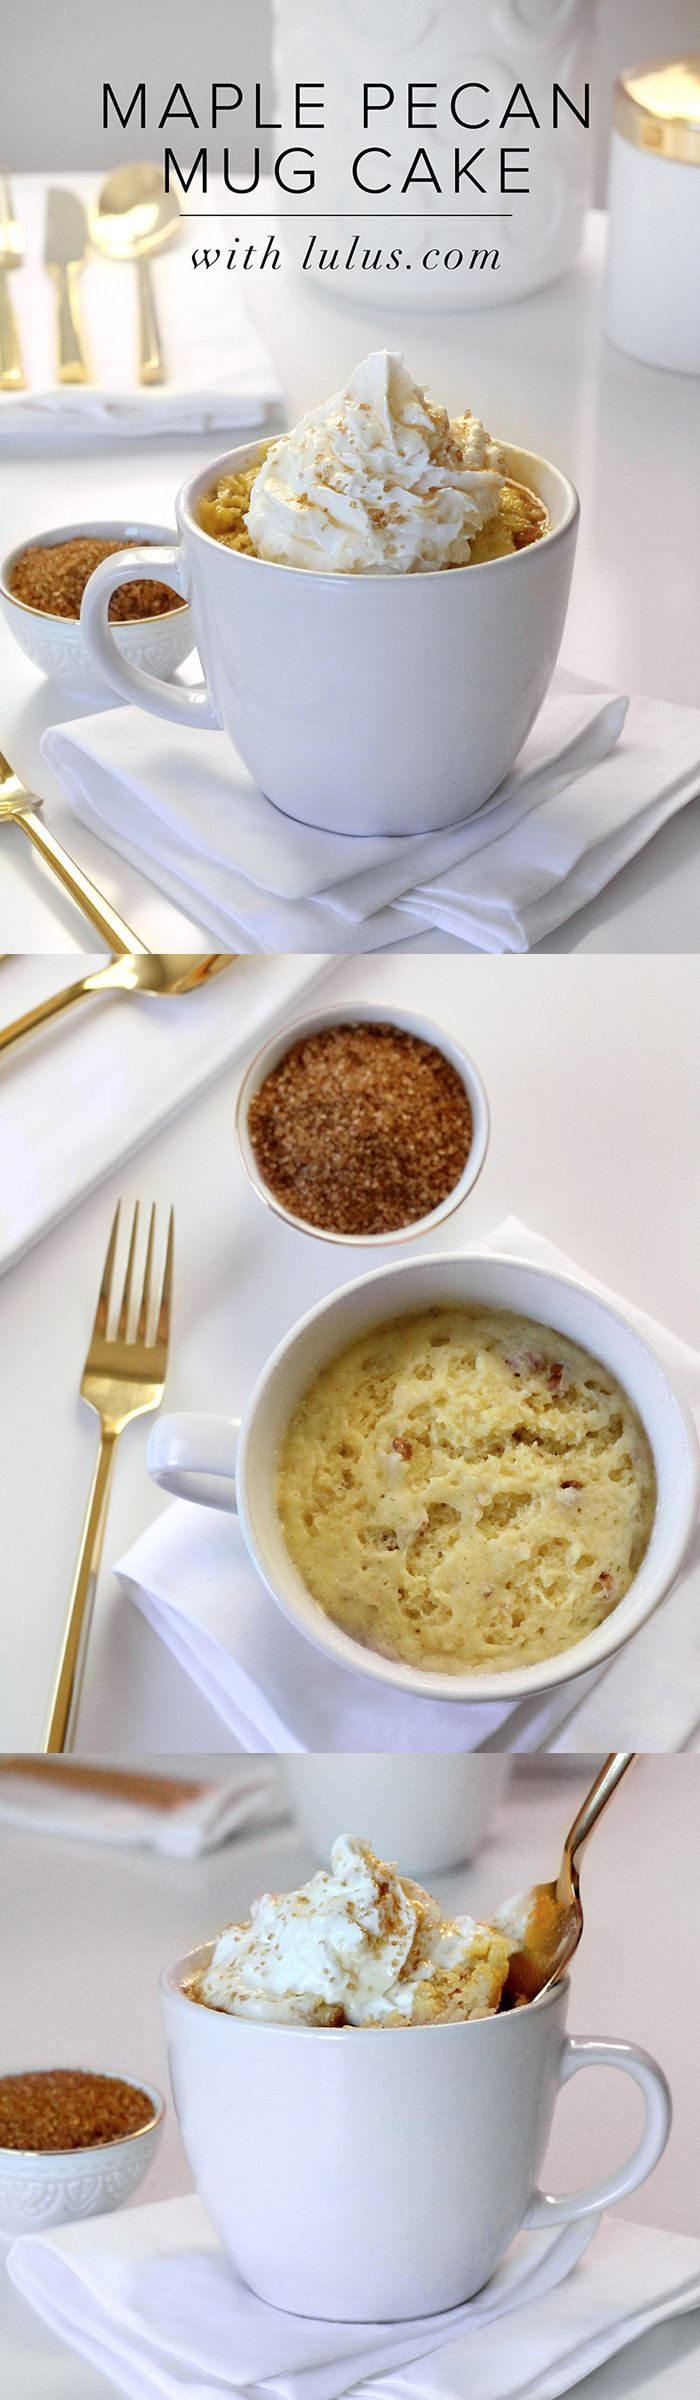 Stone Wave Dessert Recipes The Perfect Thanksgiving Dessert Maple Pecan Mug Cake Pecans